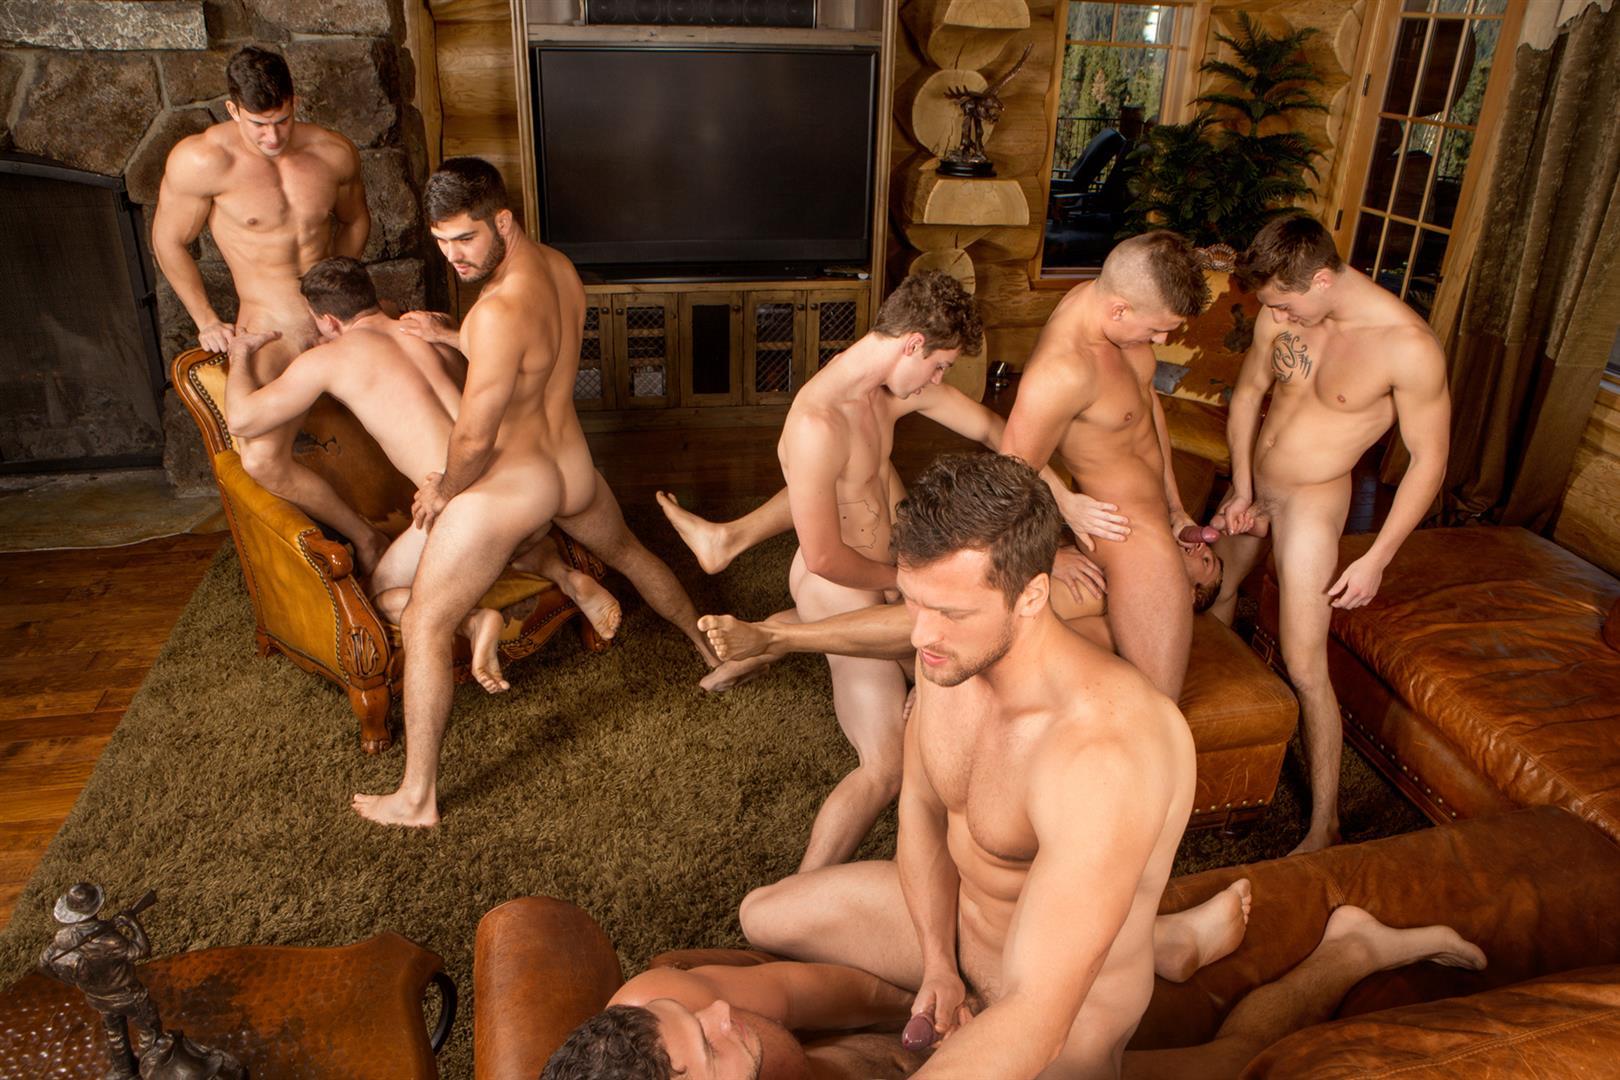 Sean-Cody-Winter-Getaway-Day-5-Big-Dick-Hunks-Fucking-Bareback-Amateur-Gay-Porn-13 Sean Cody Takes The Boys On A 8-Day Bareback Winter Getaway